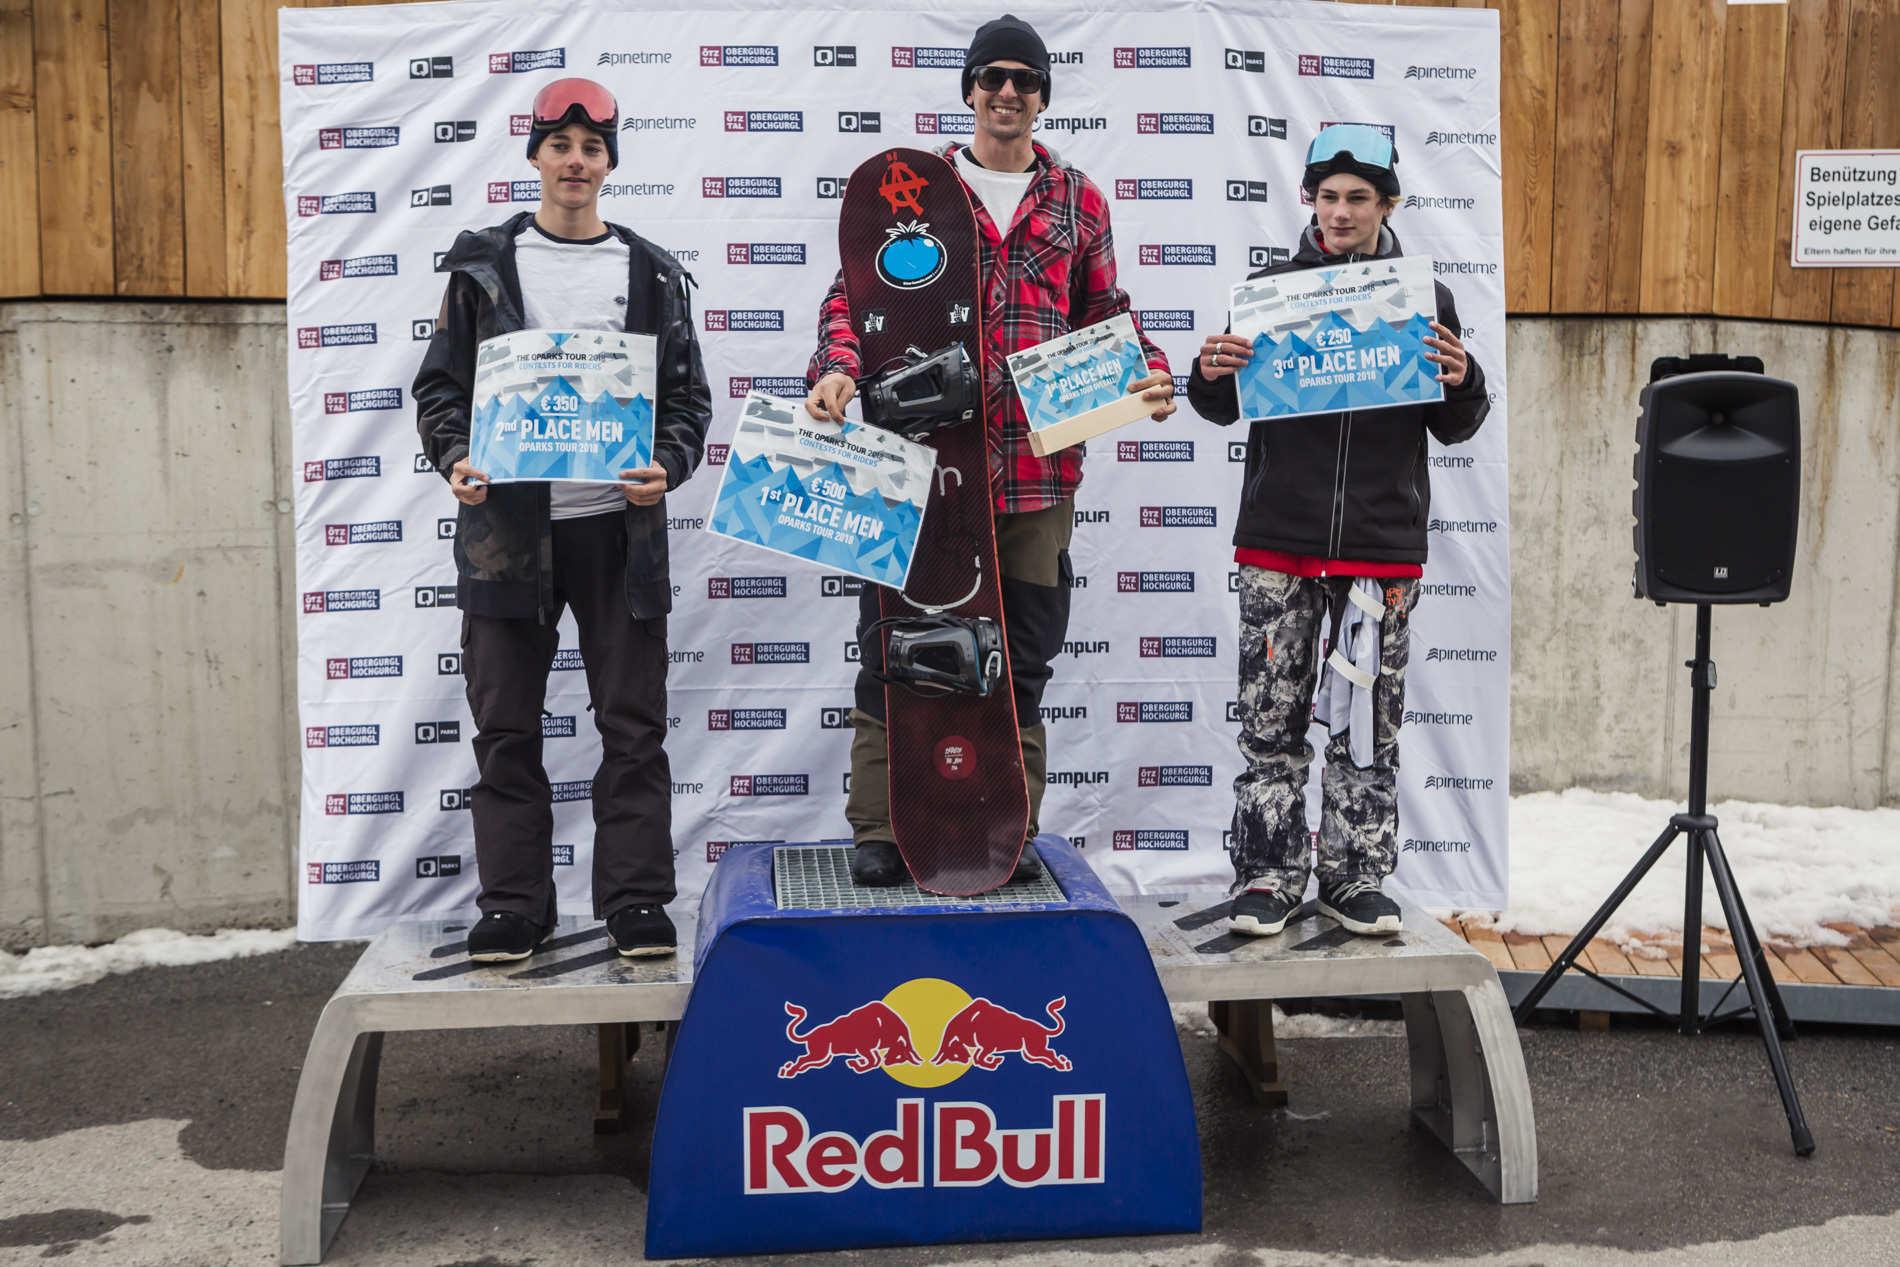 obergurgl tourfinale 15 04 2018 roland haschka qparks 022